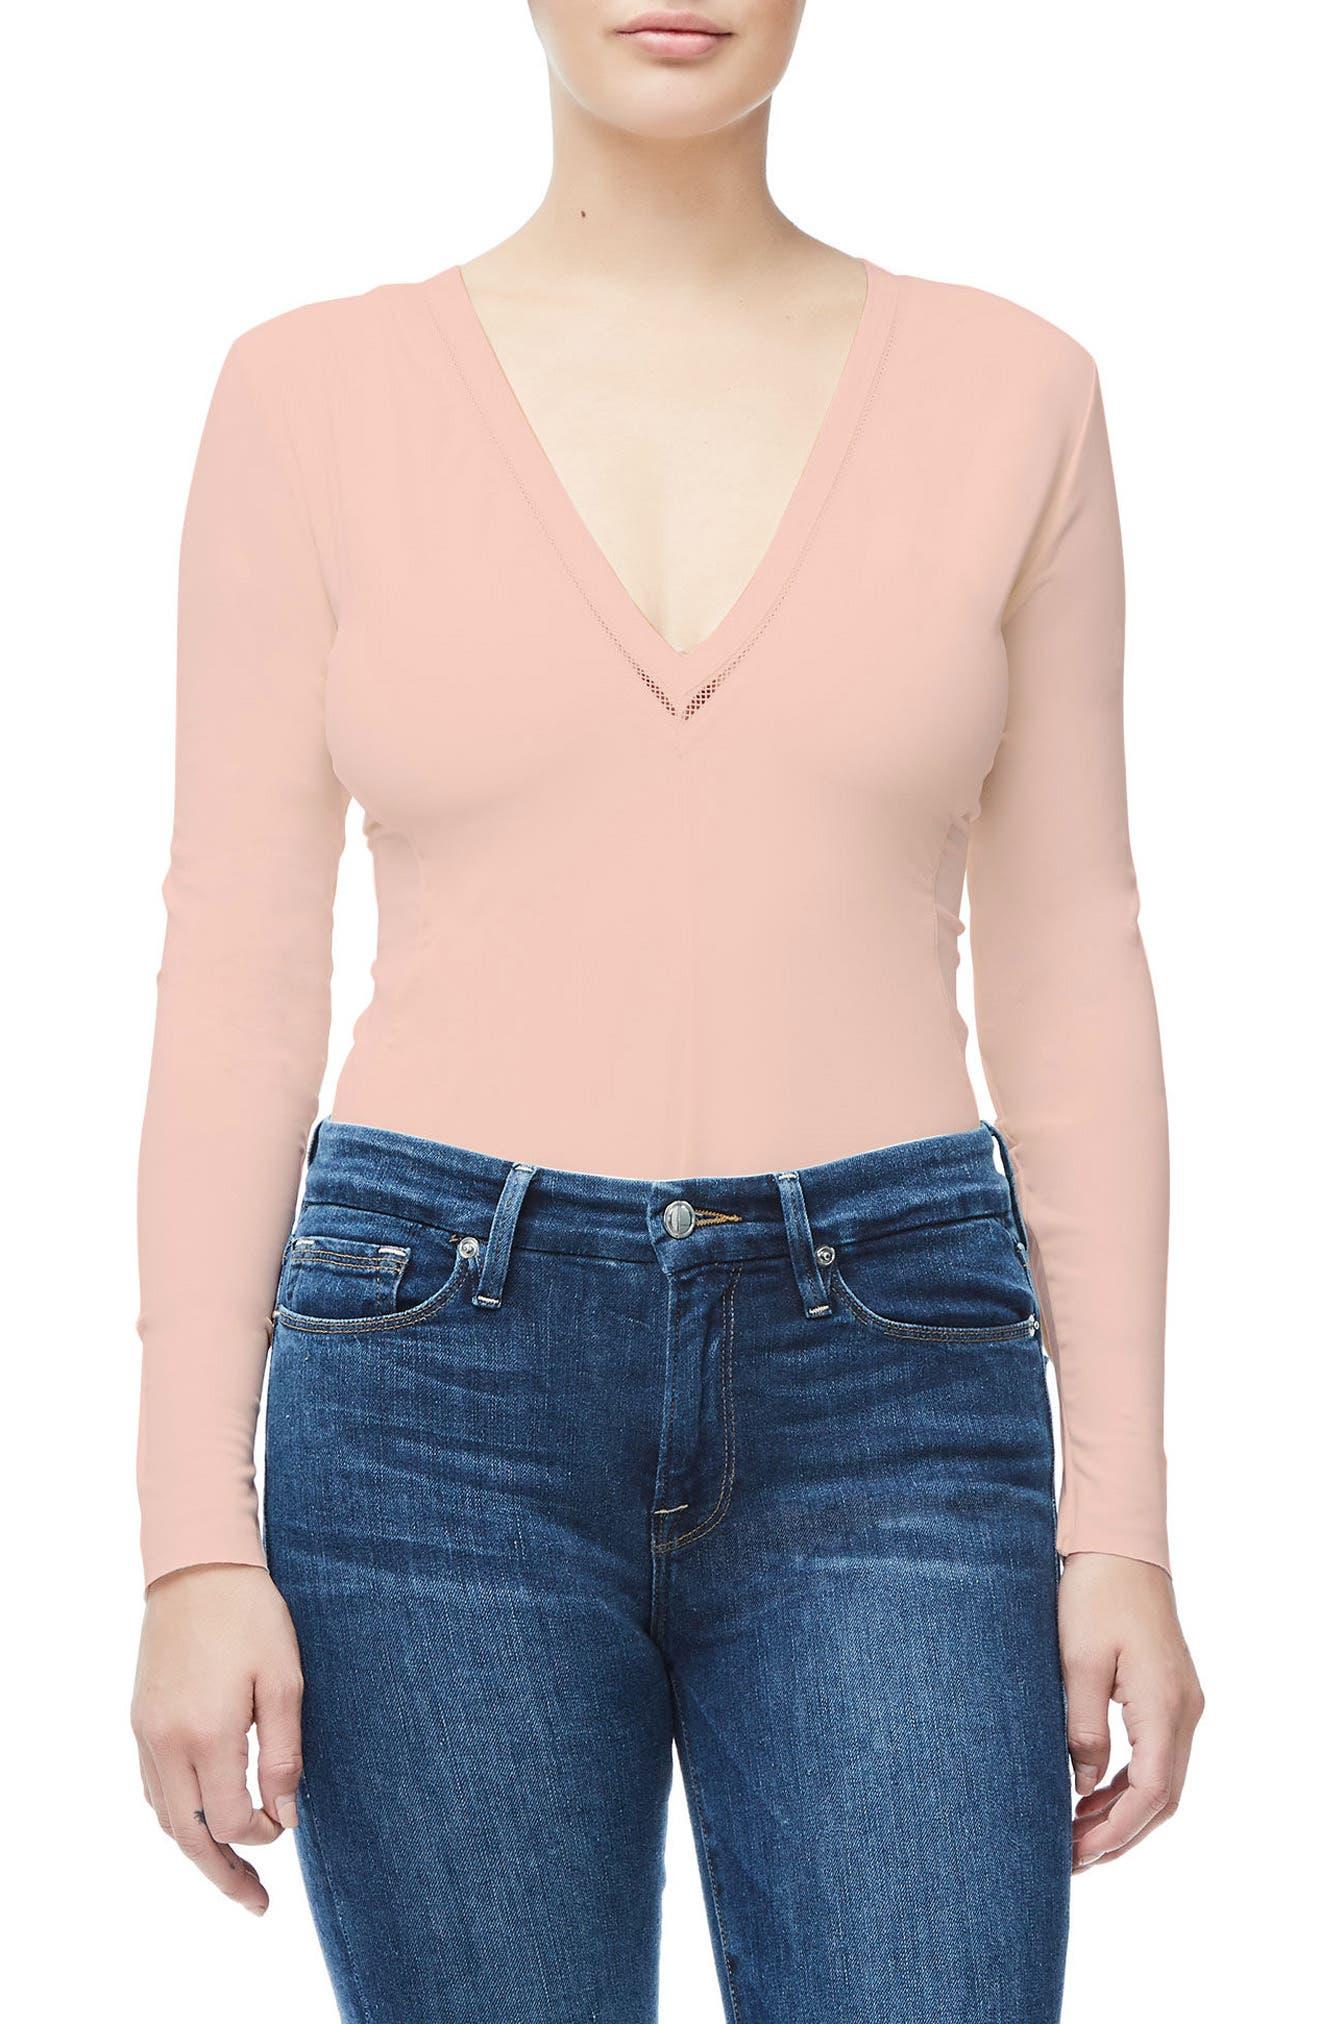 Good Body Low Down Thong Bodysuit,                             Main thumbnail 1, color,                             Blush001